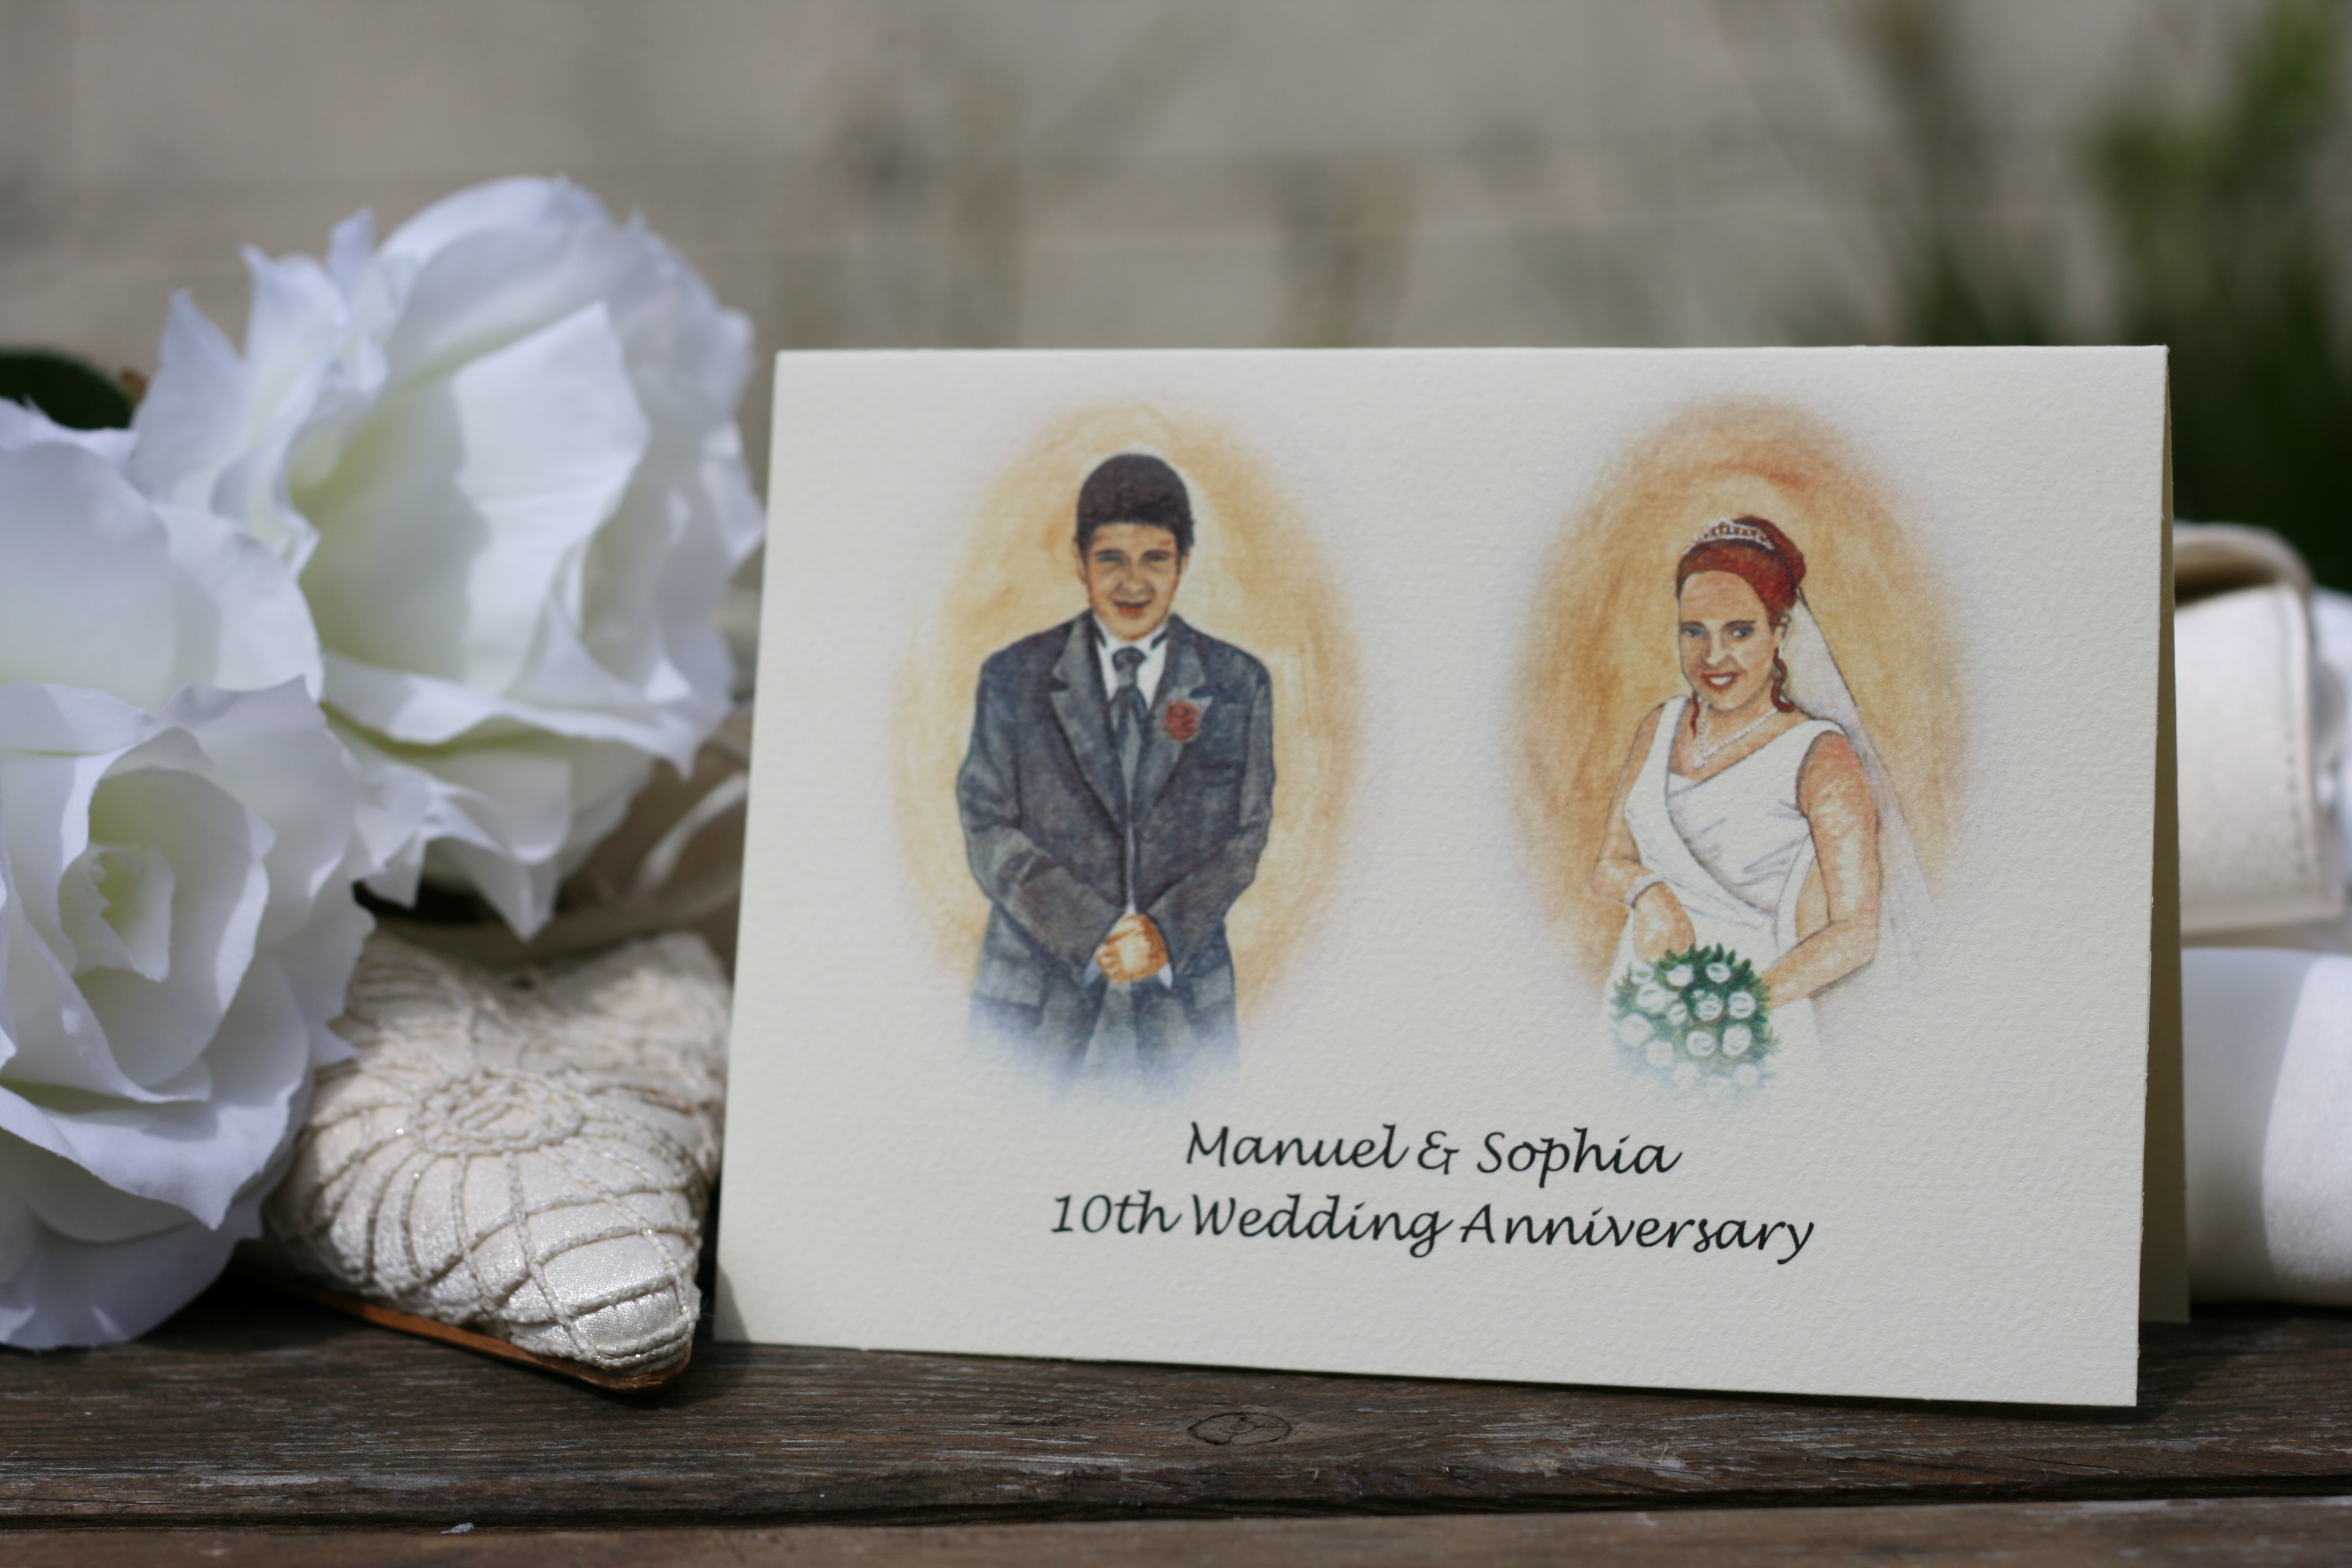 10th Wedding Anniversary Invitations: 10th Wedding Anniversary Invitations